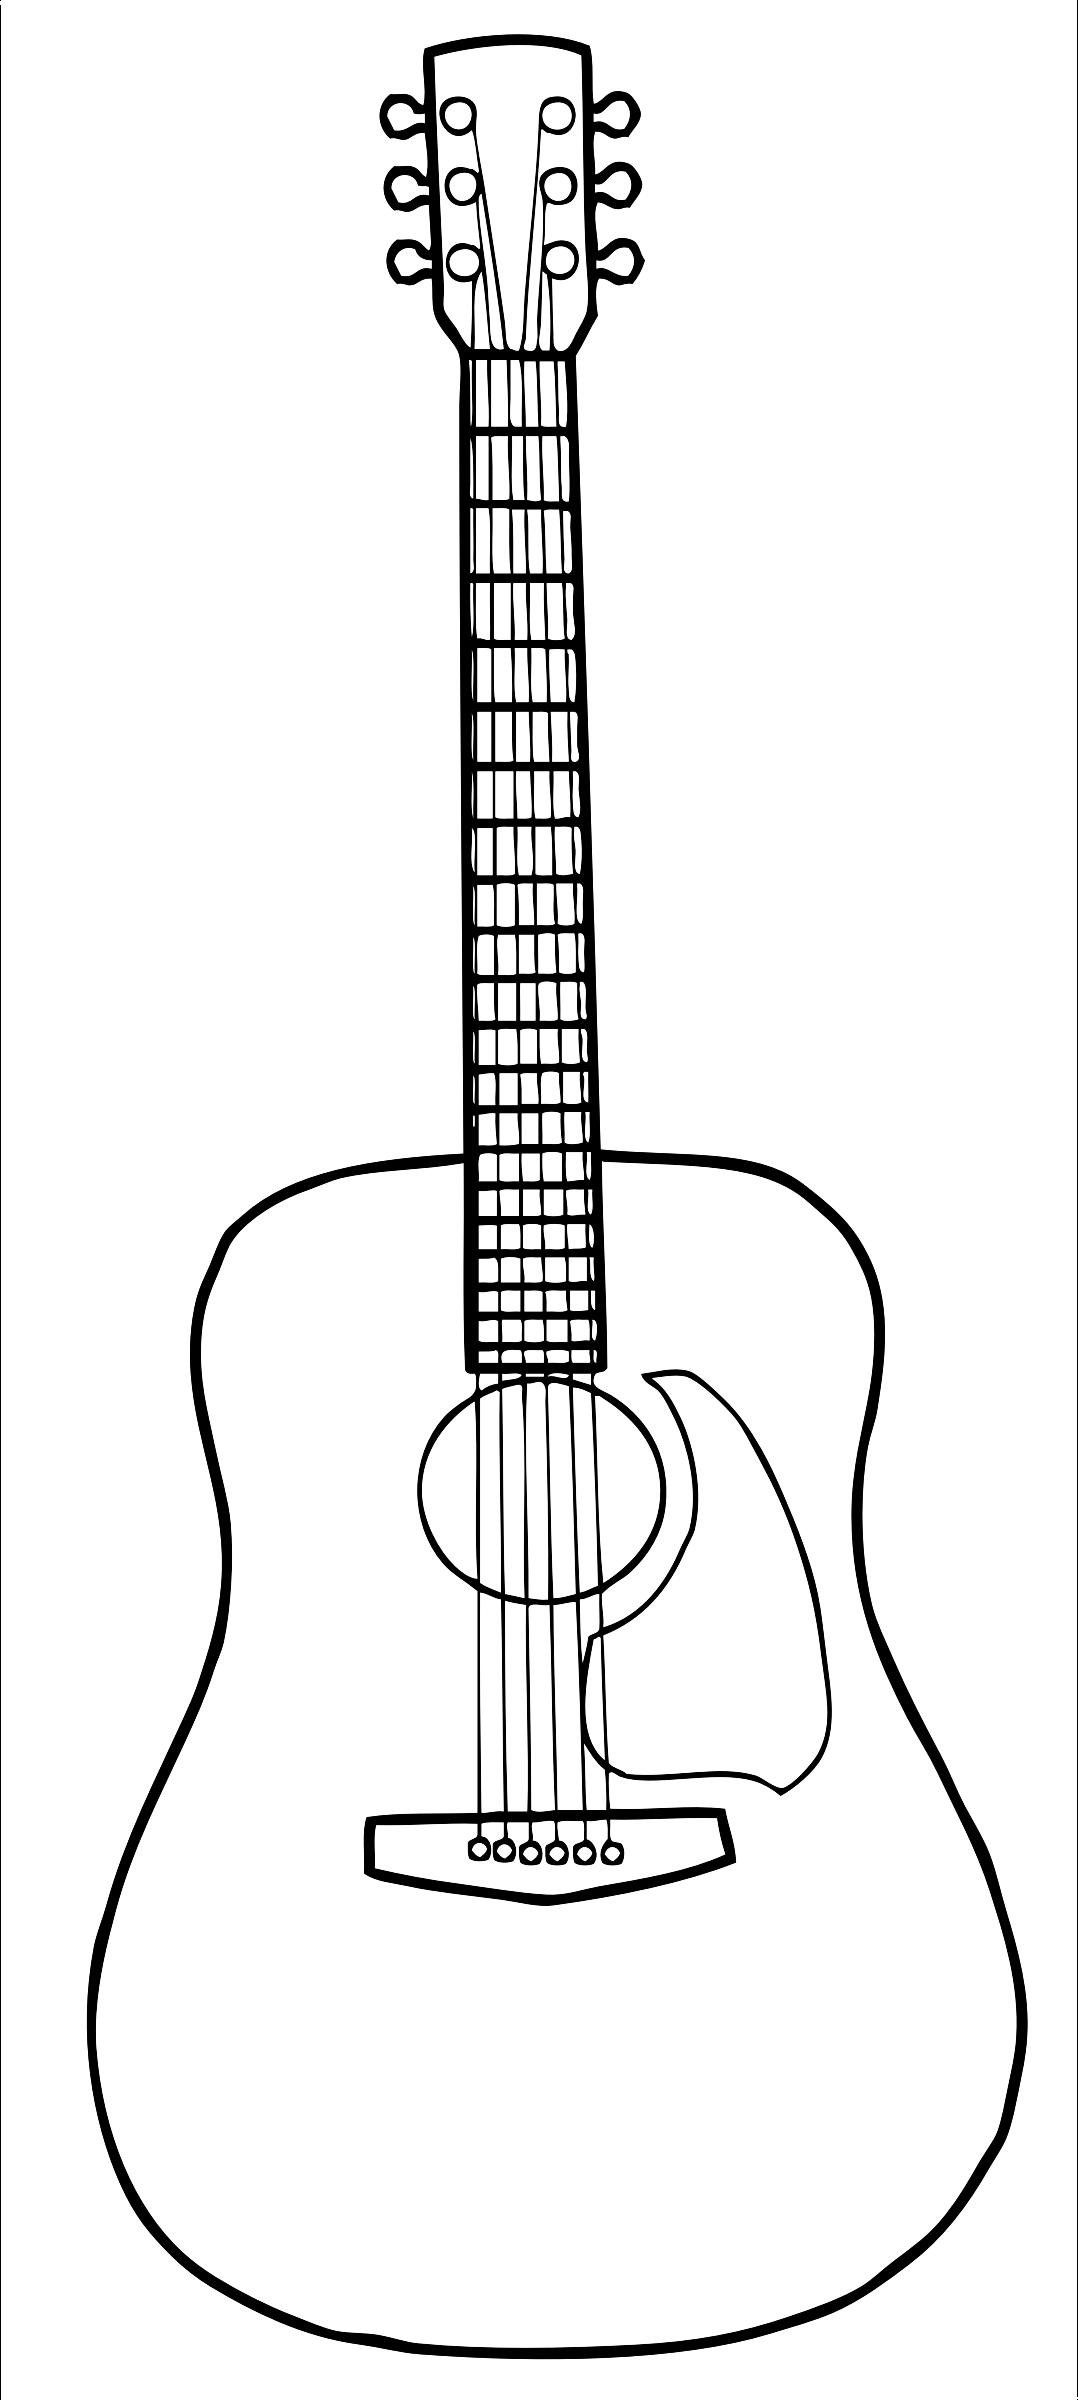 Clipart guitar simple.